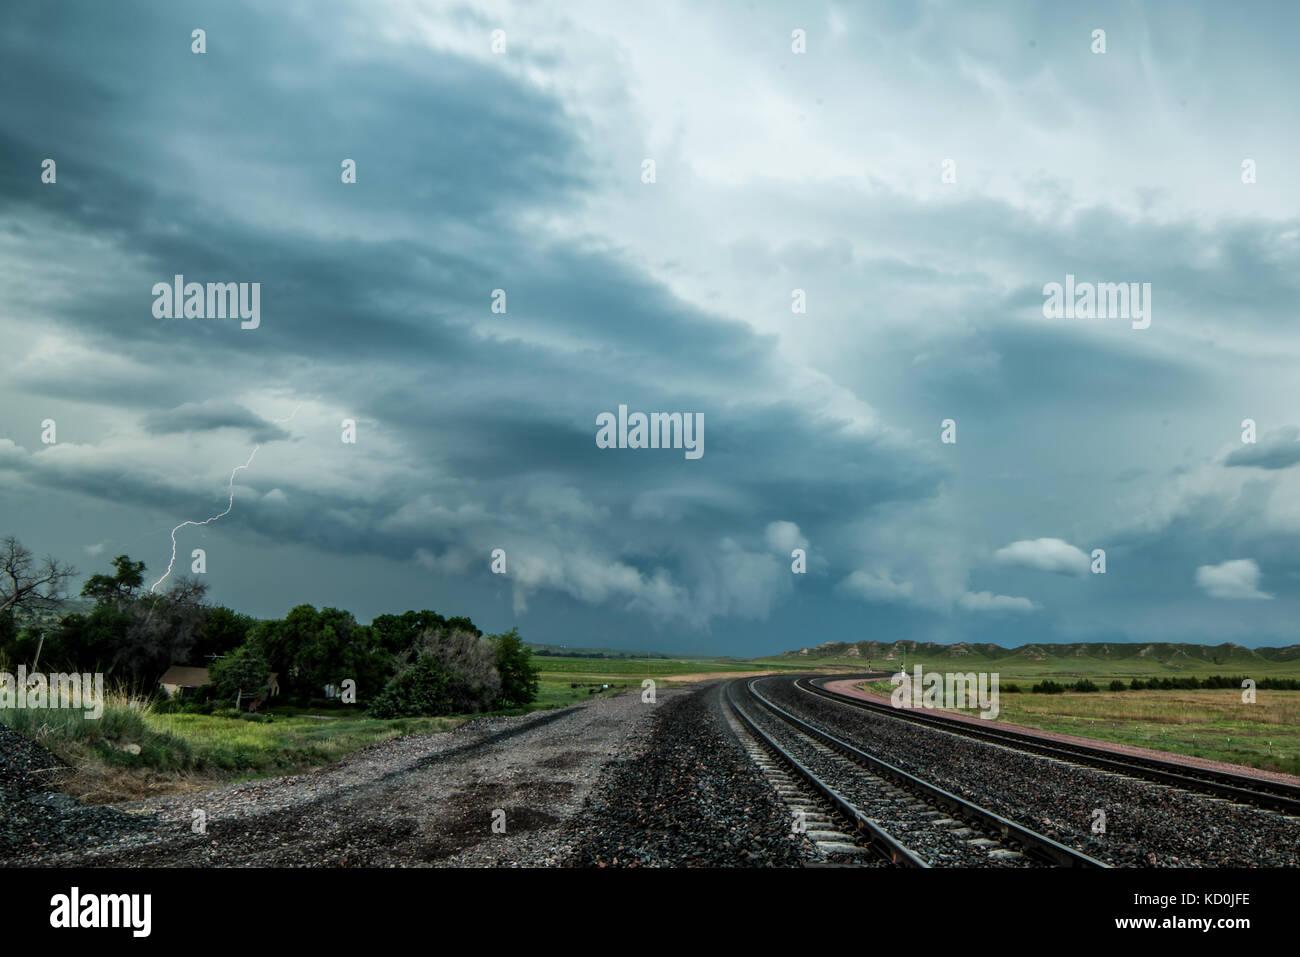 Supercell tornadiques commence à se dissiper après la production de tornades, scottsbluff, Nebraska, USA Photo Stock